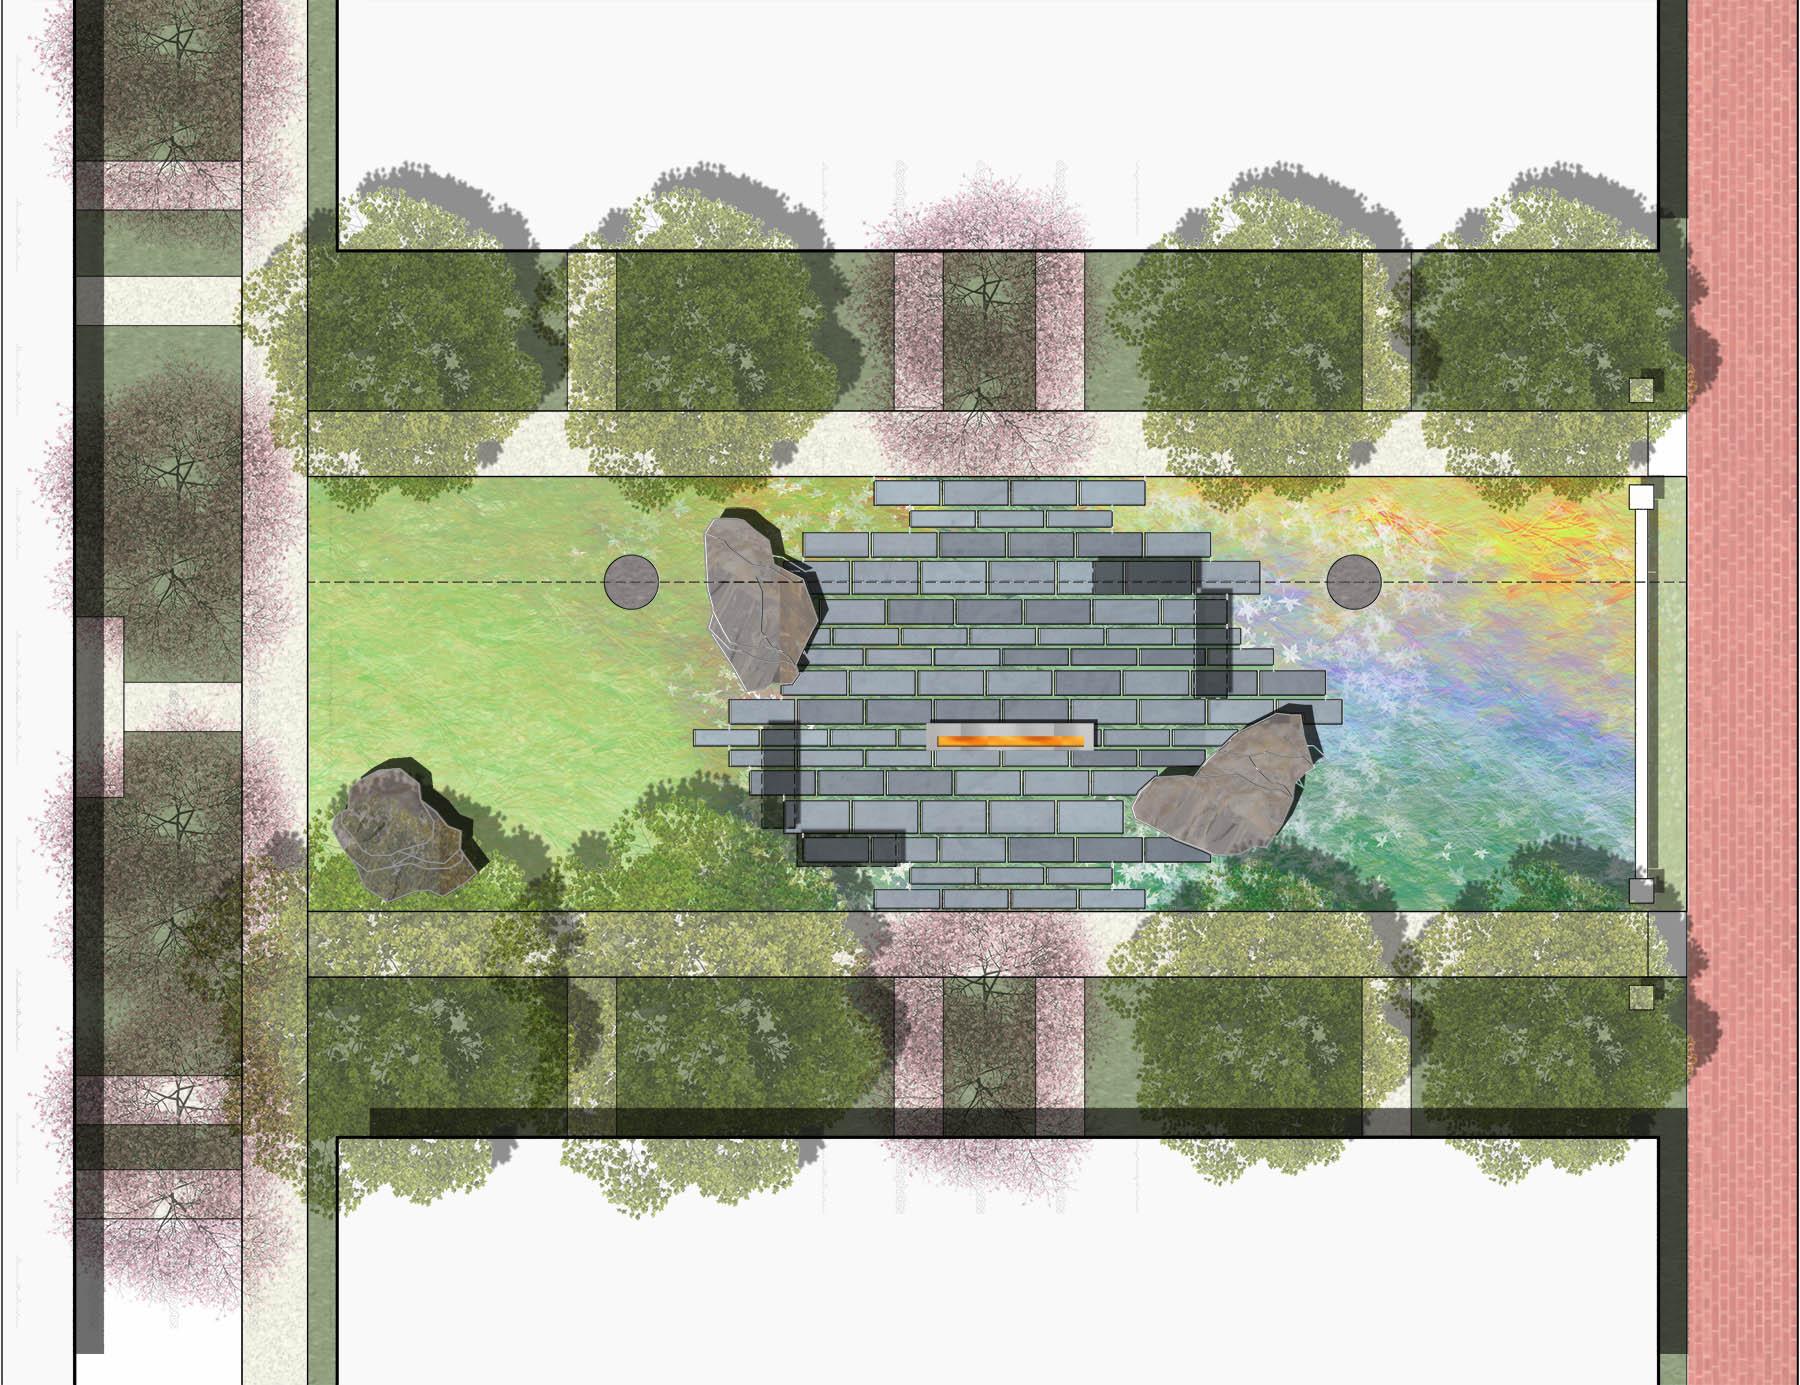 C:UsersqiaojueyDesktopBraddock Loft Plan rendering (1)